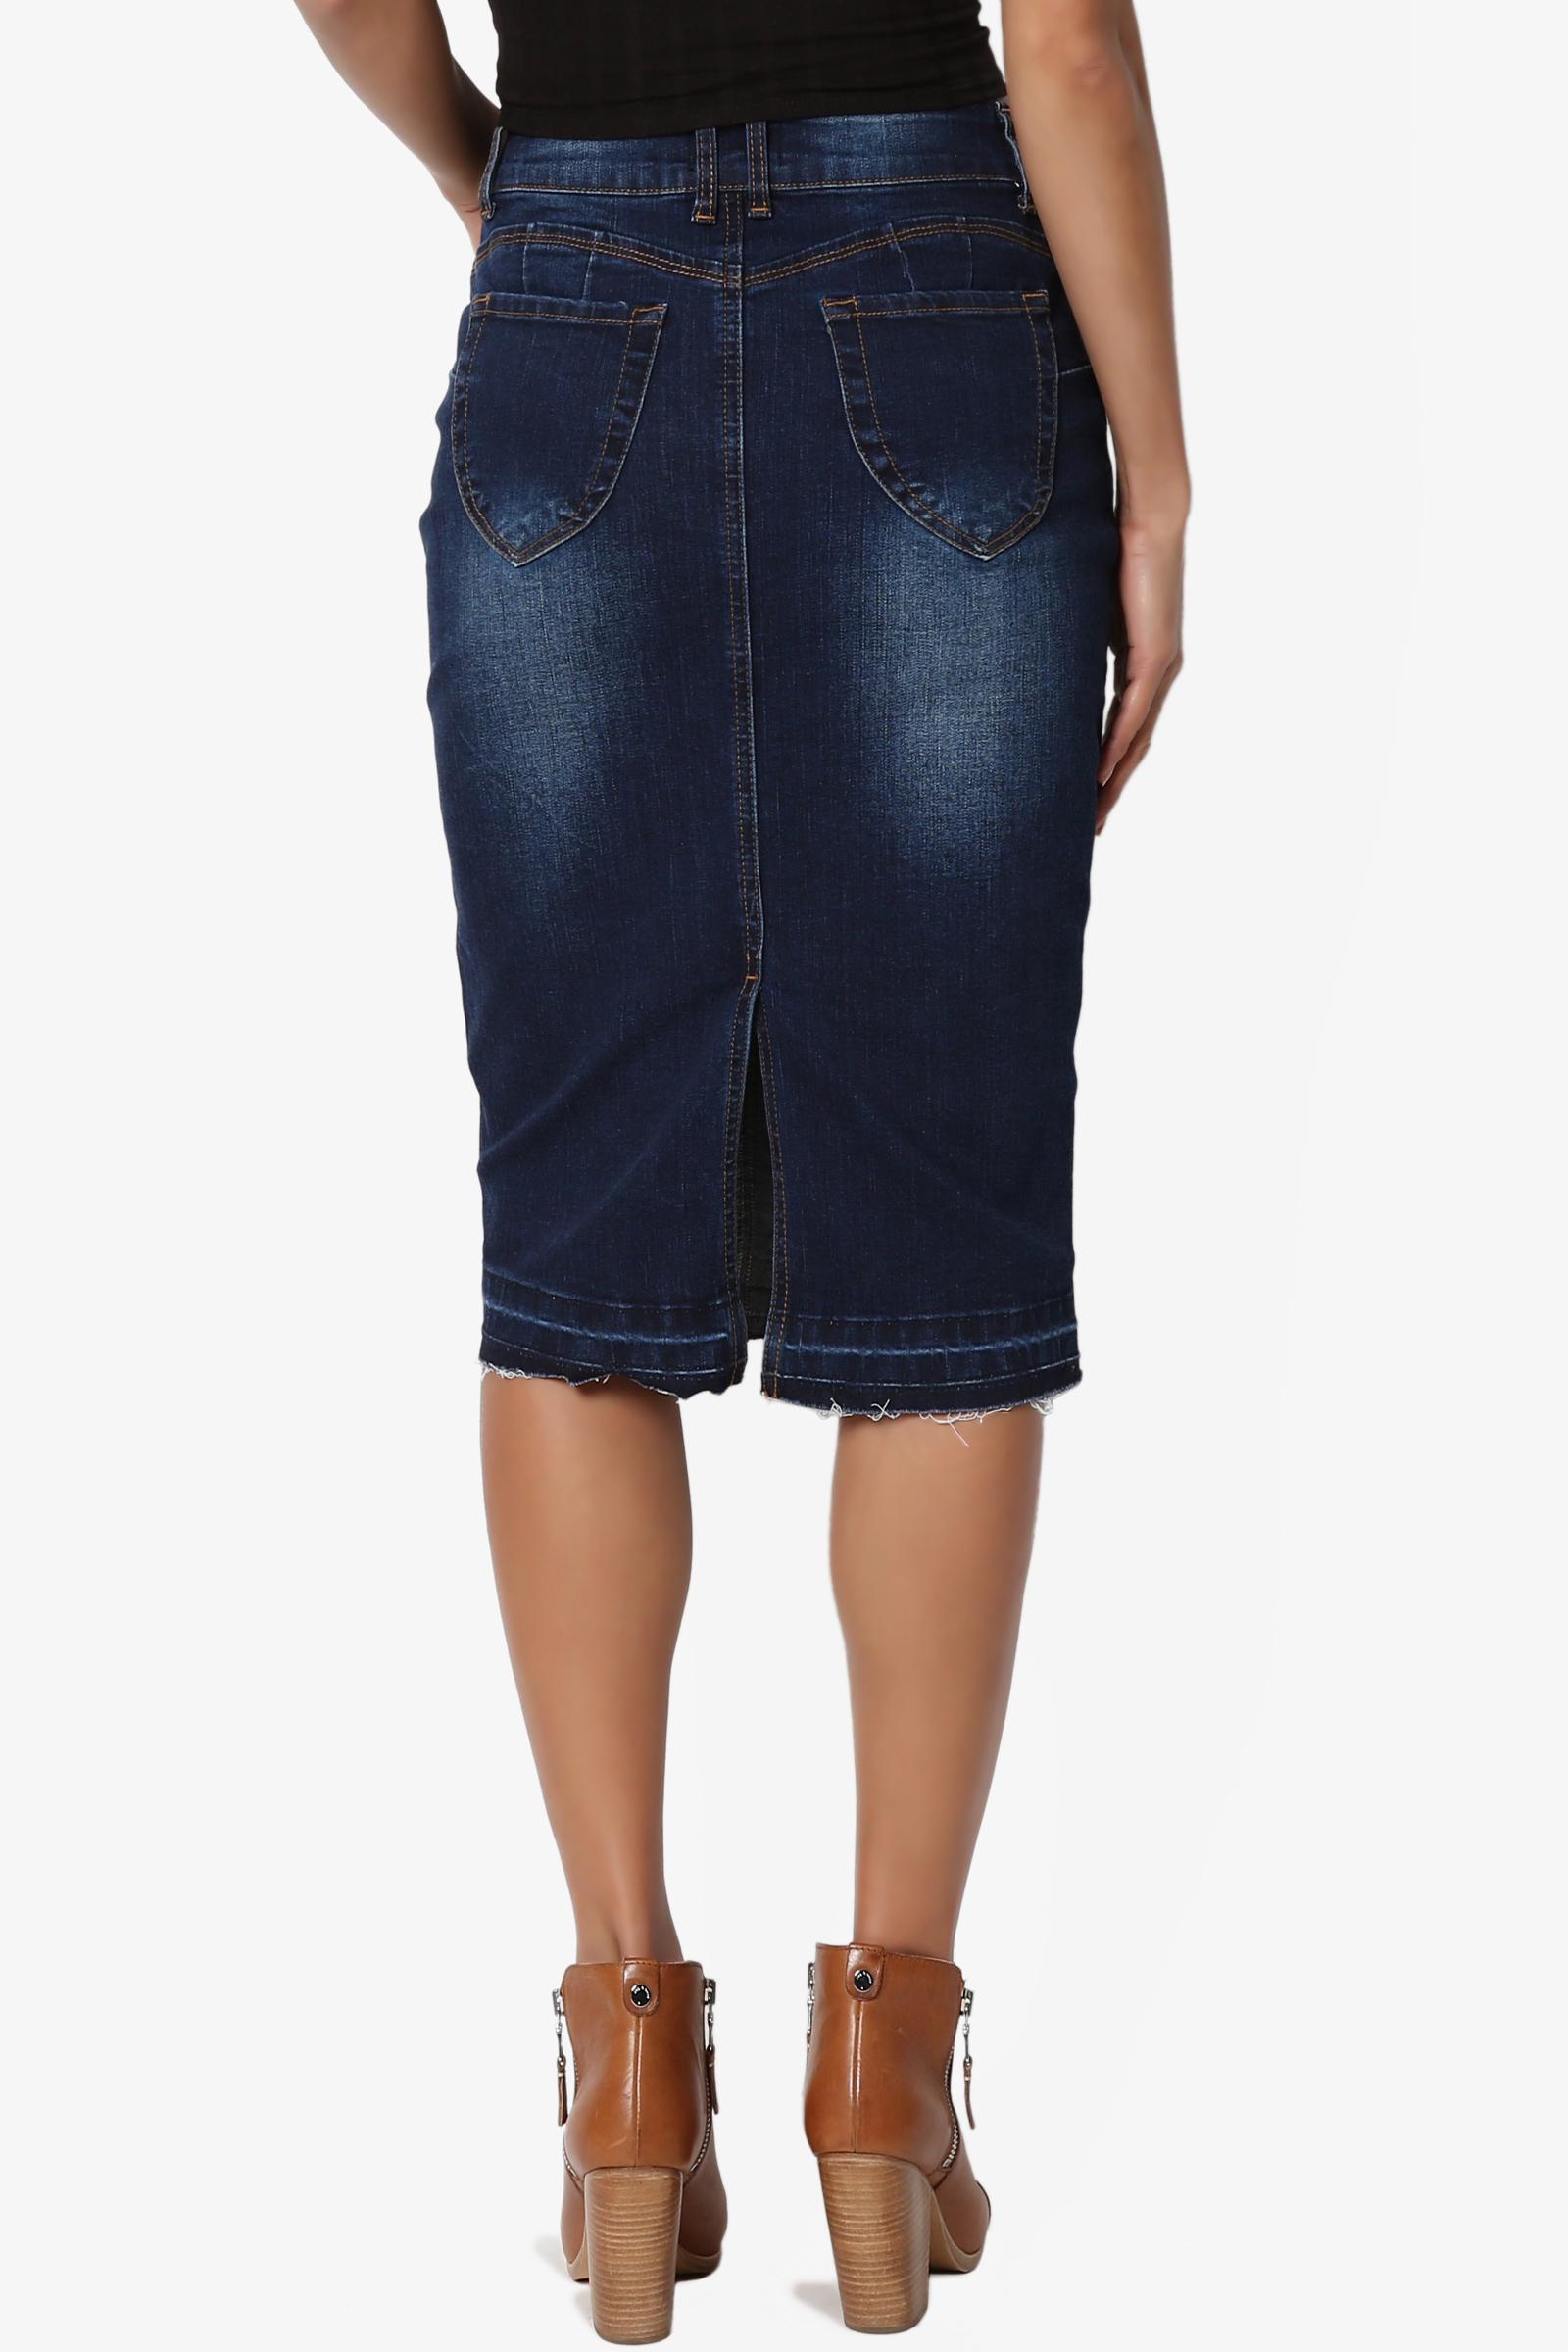 TheMogan Vintage Casual Wash Blue Jean Pencil Knee Length Midi Soft Denim Skirt